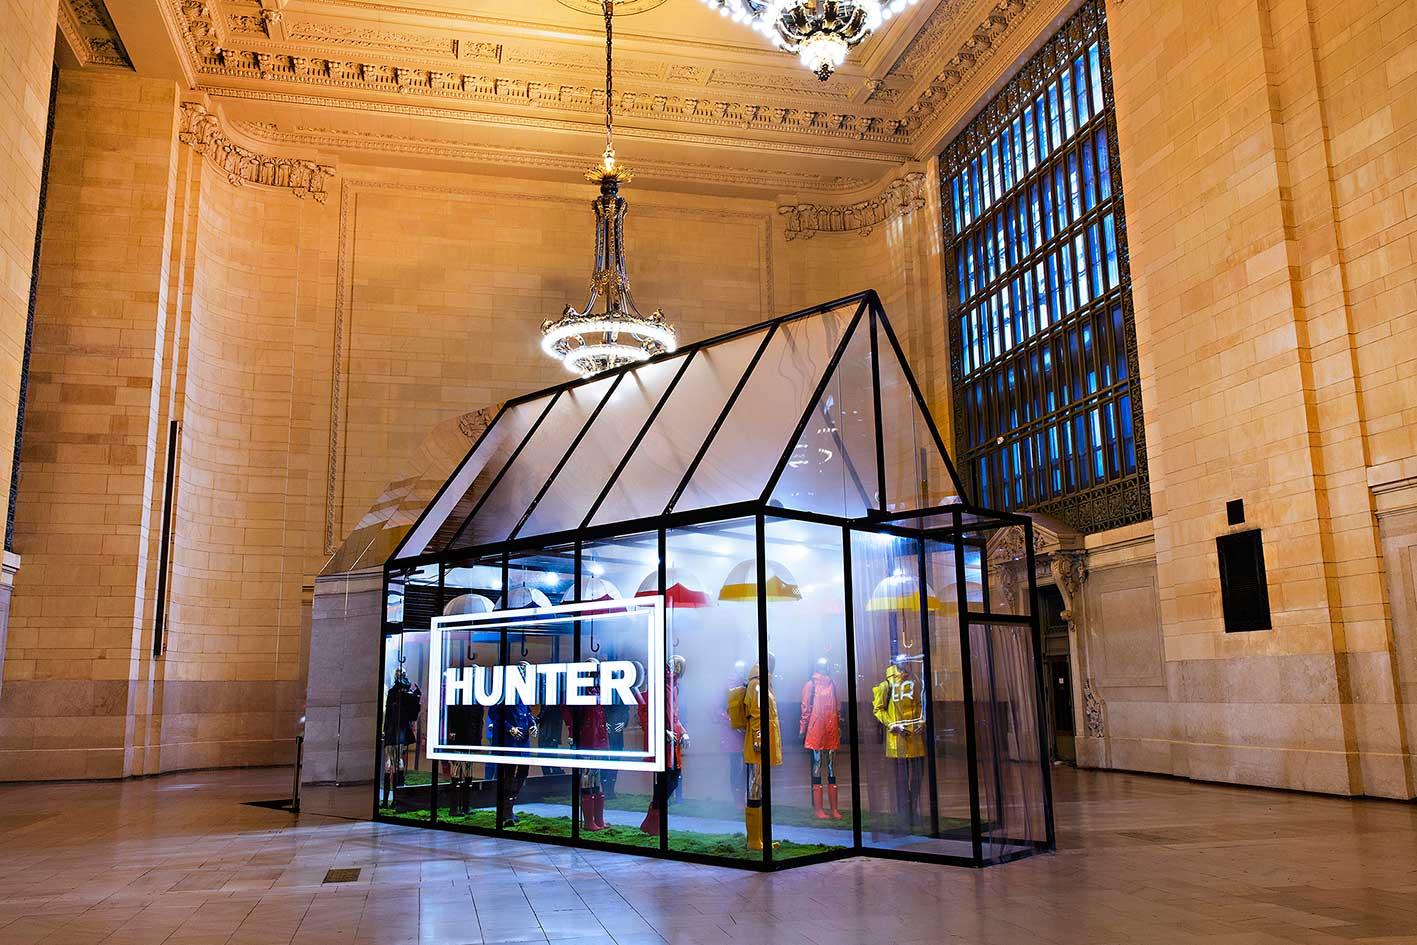 The Hunter installation in New York